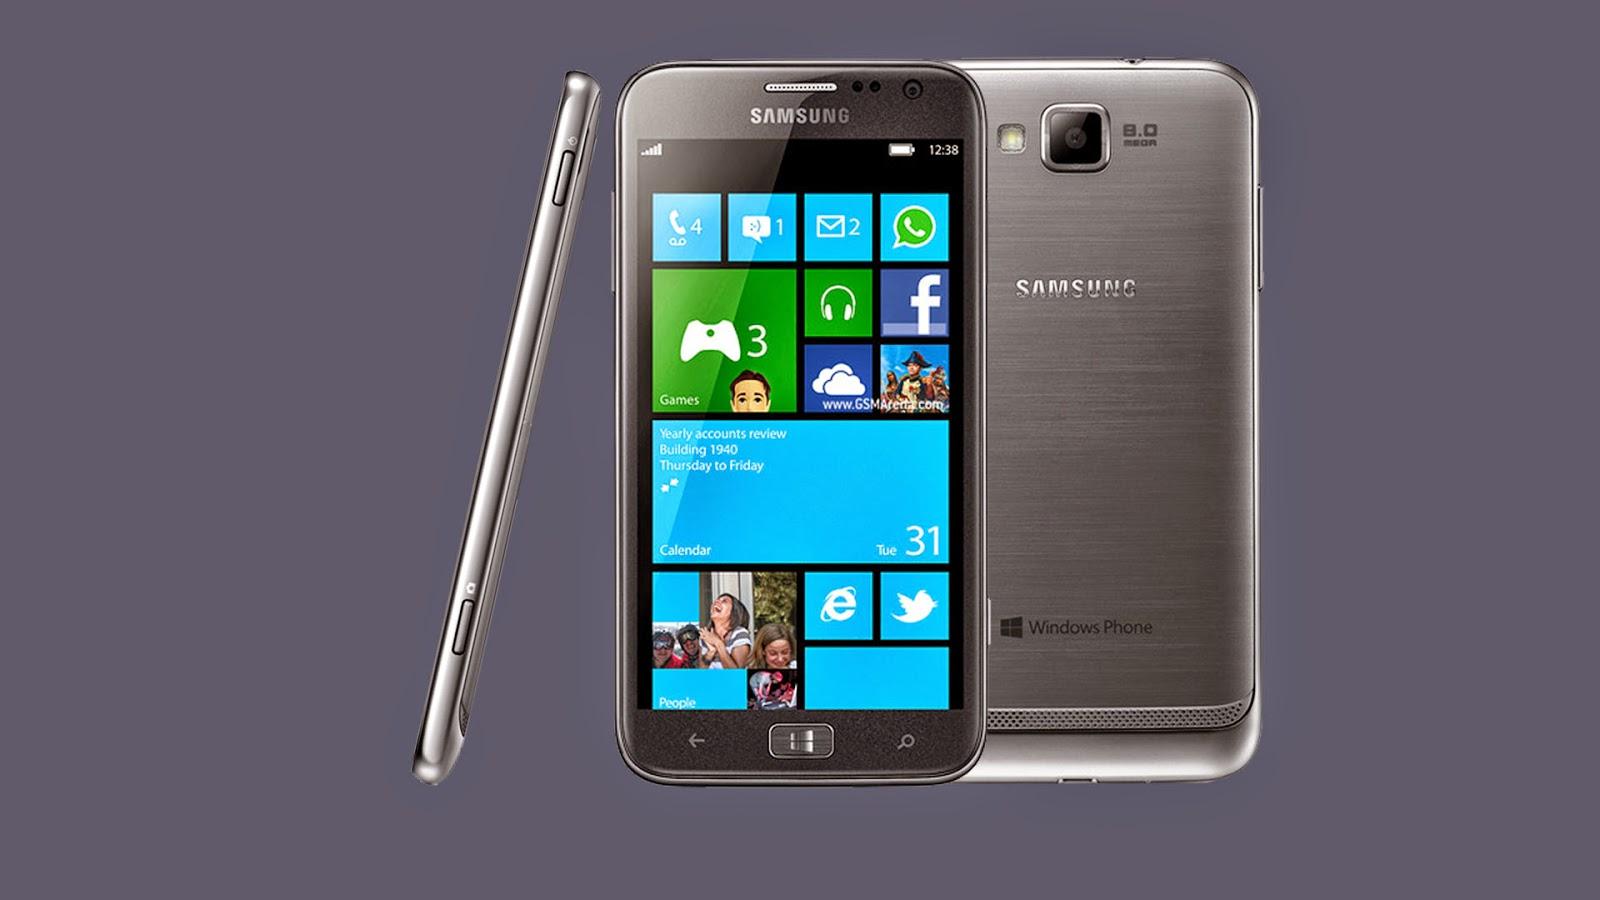 Daftar Harga Handphone Samsung OS Windows Phone Terbaru